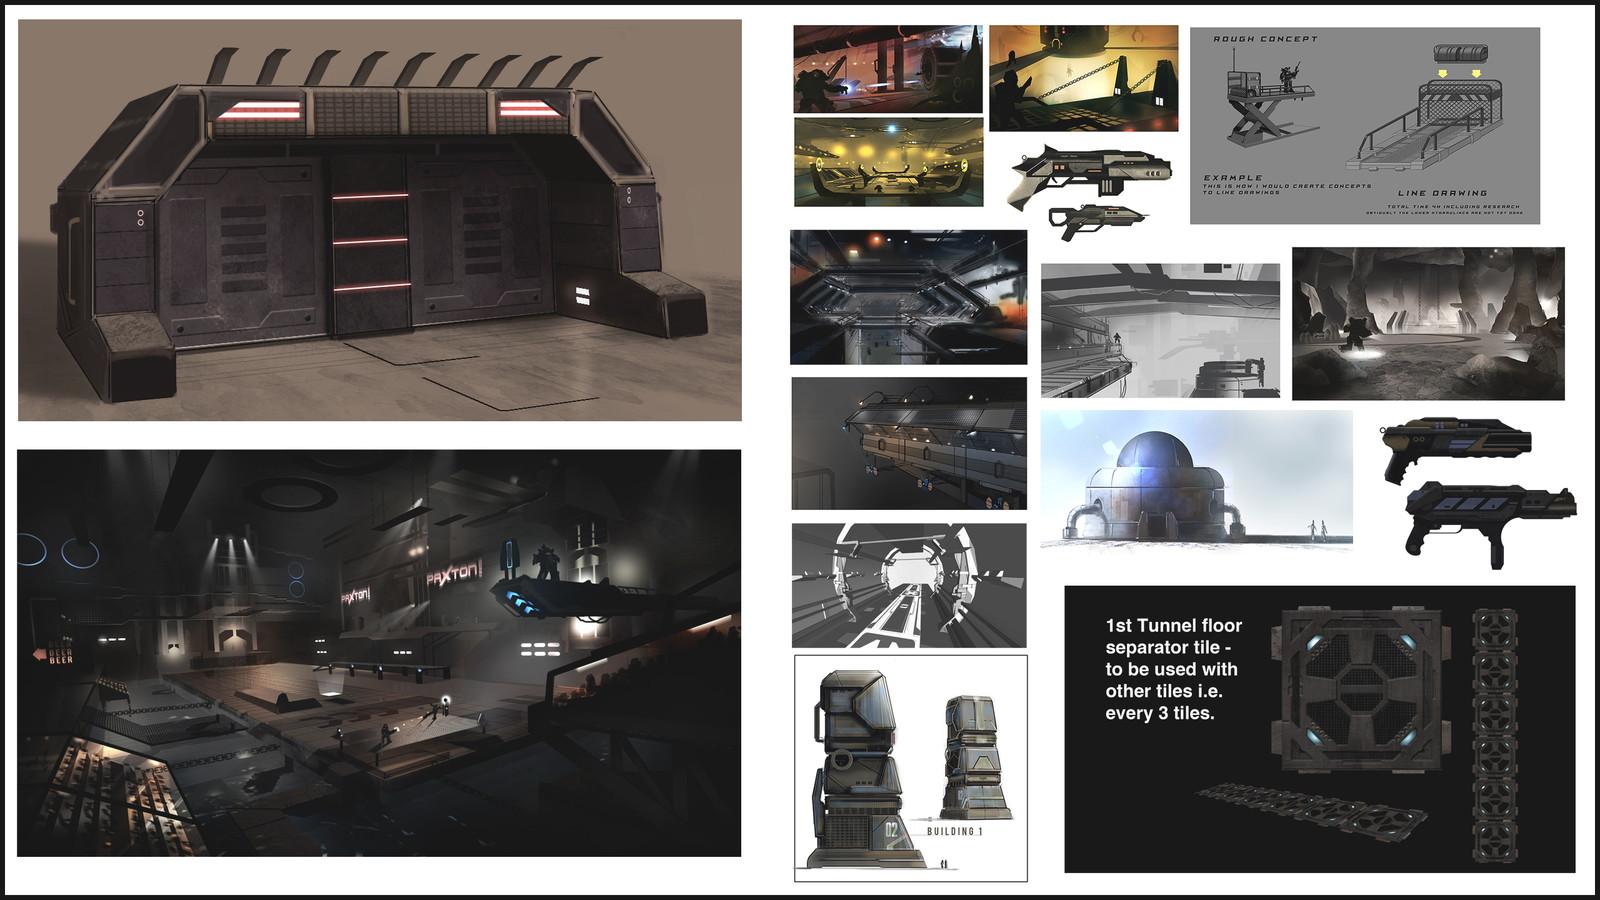 Heavy Gear Concepts 3 - 2013